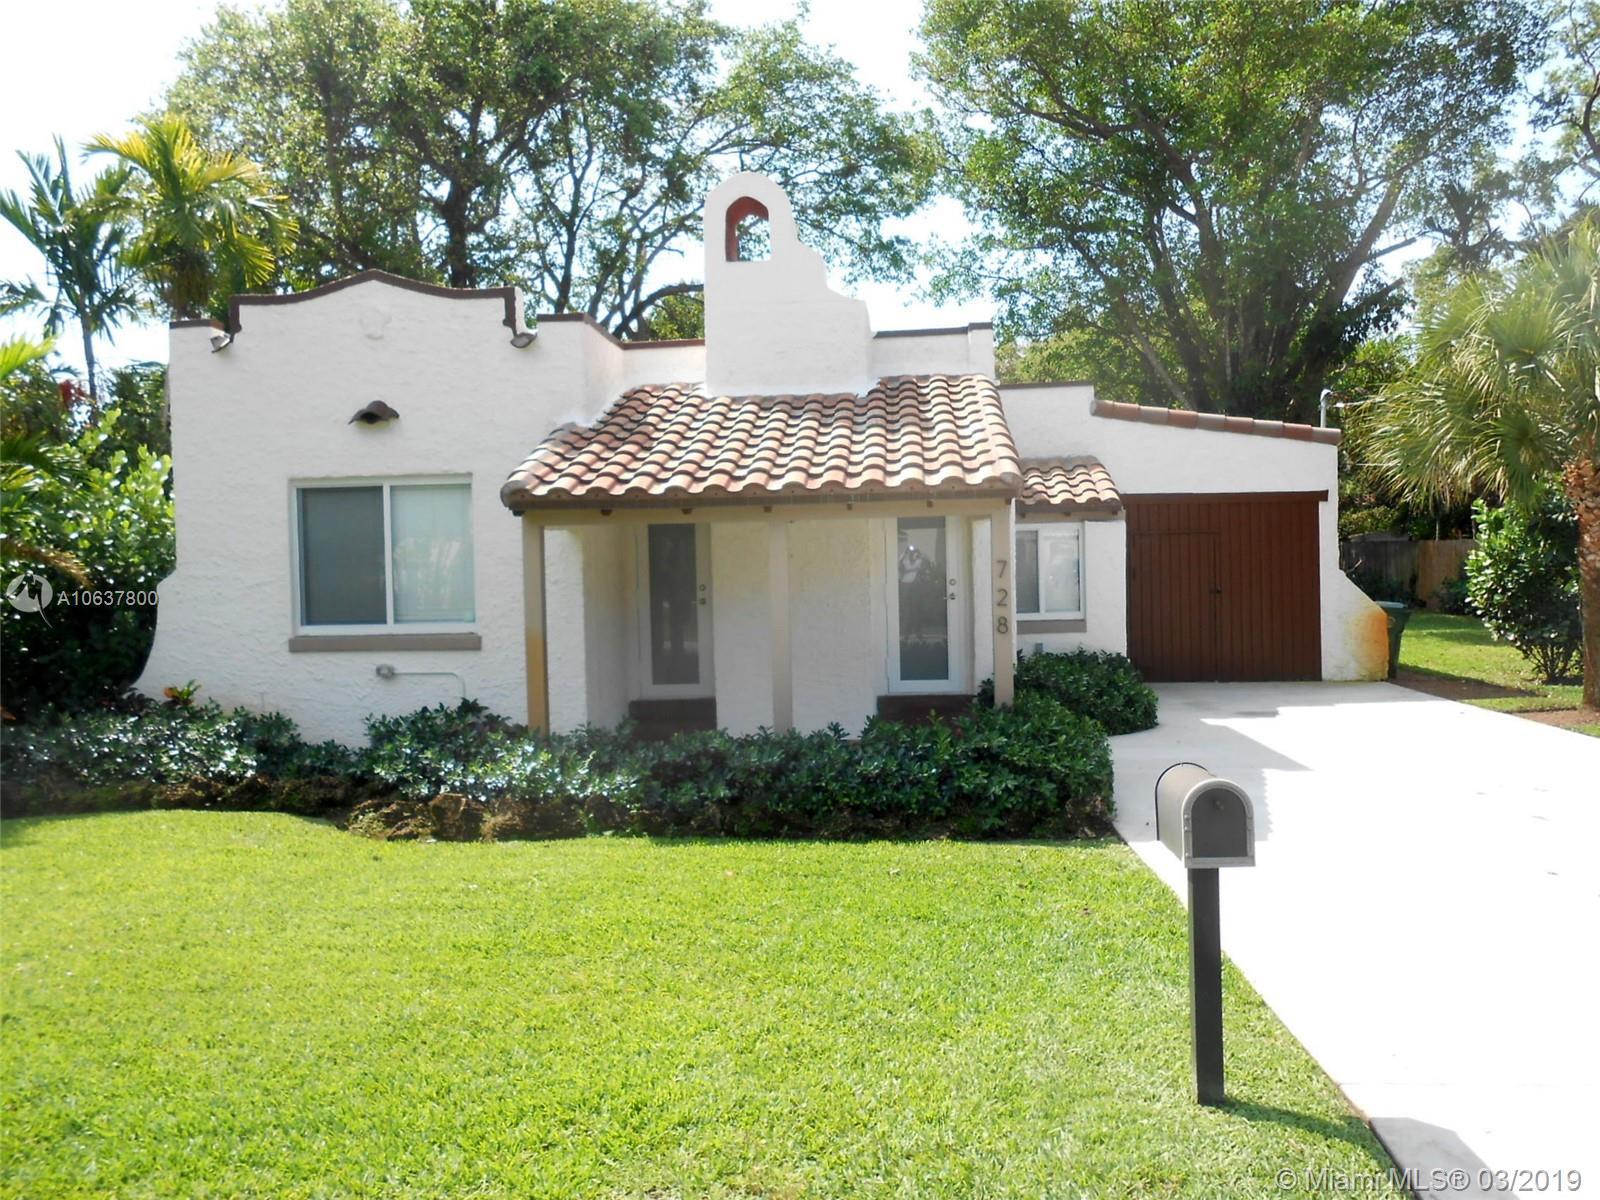 728 NE 114th St, Miami Shores, Florida